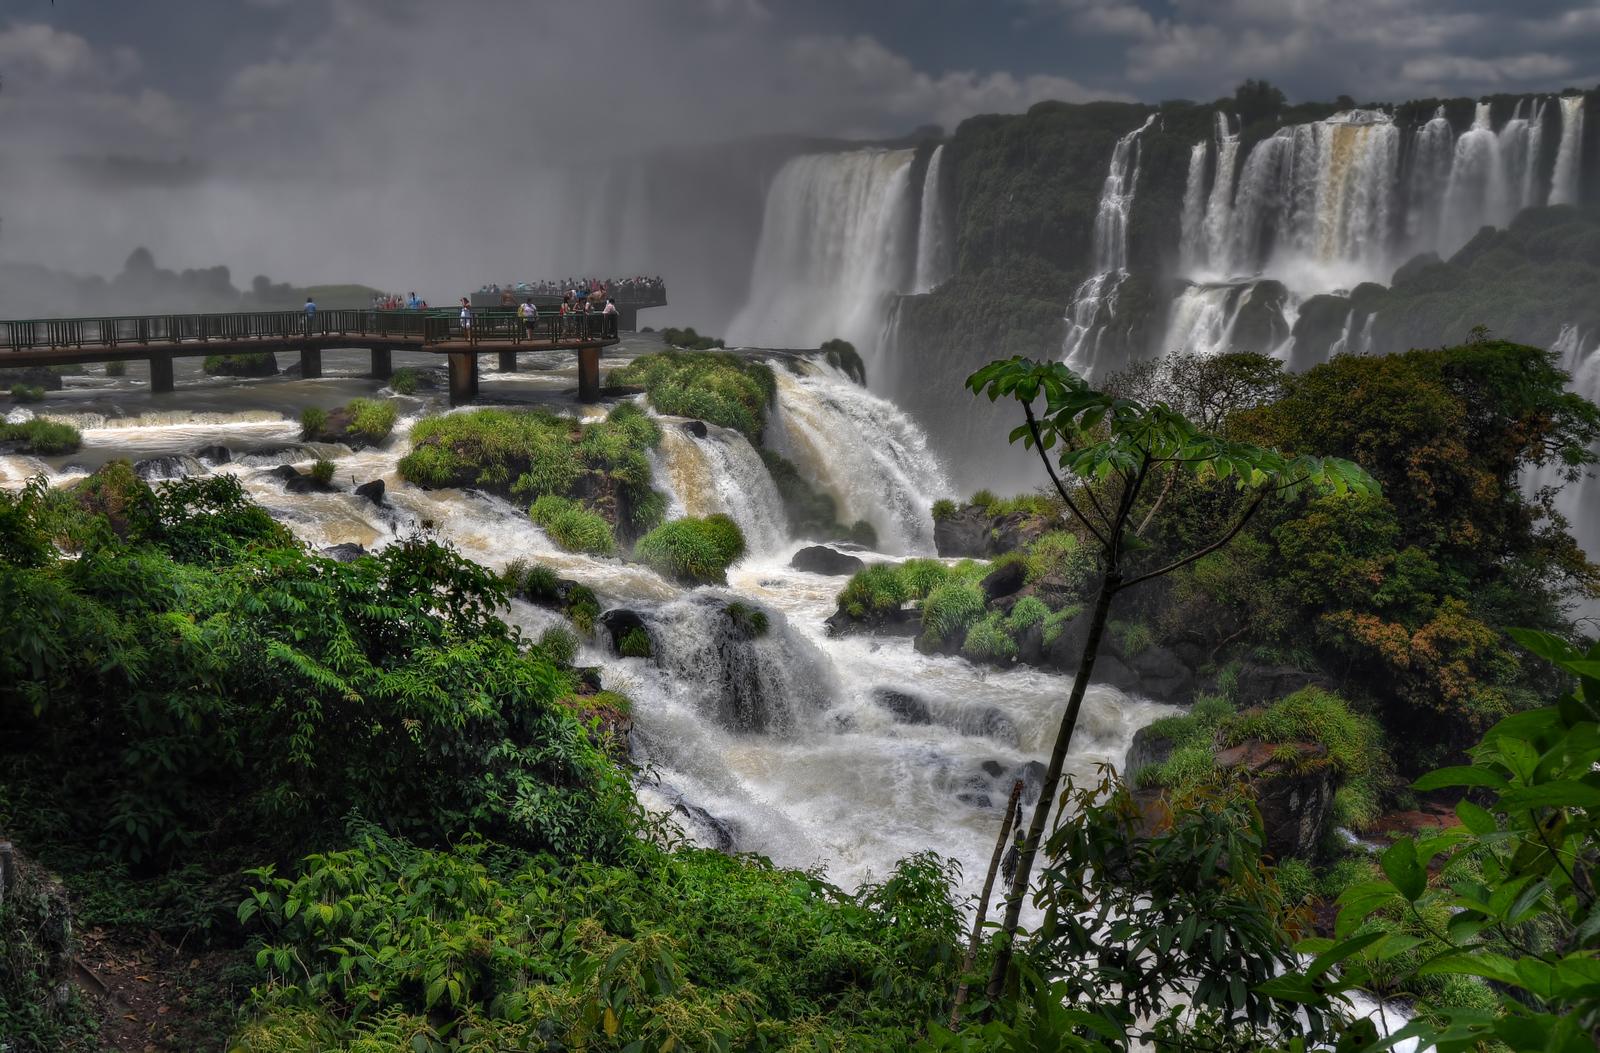 Walkway into the Falls